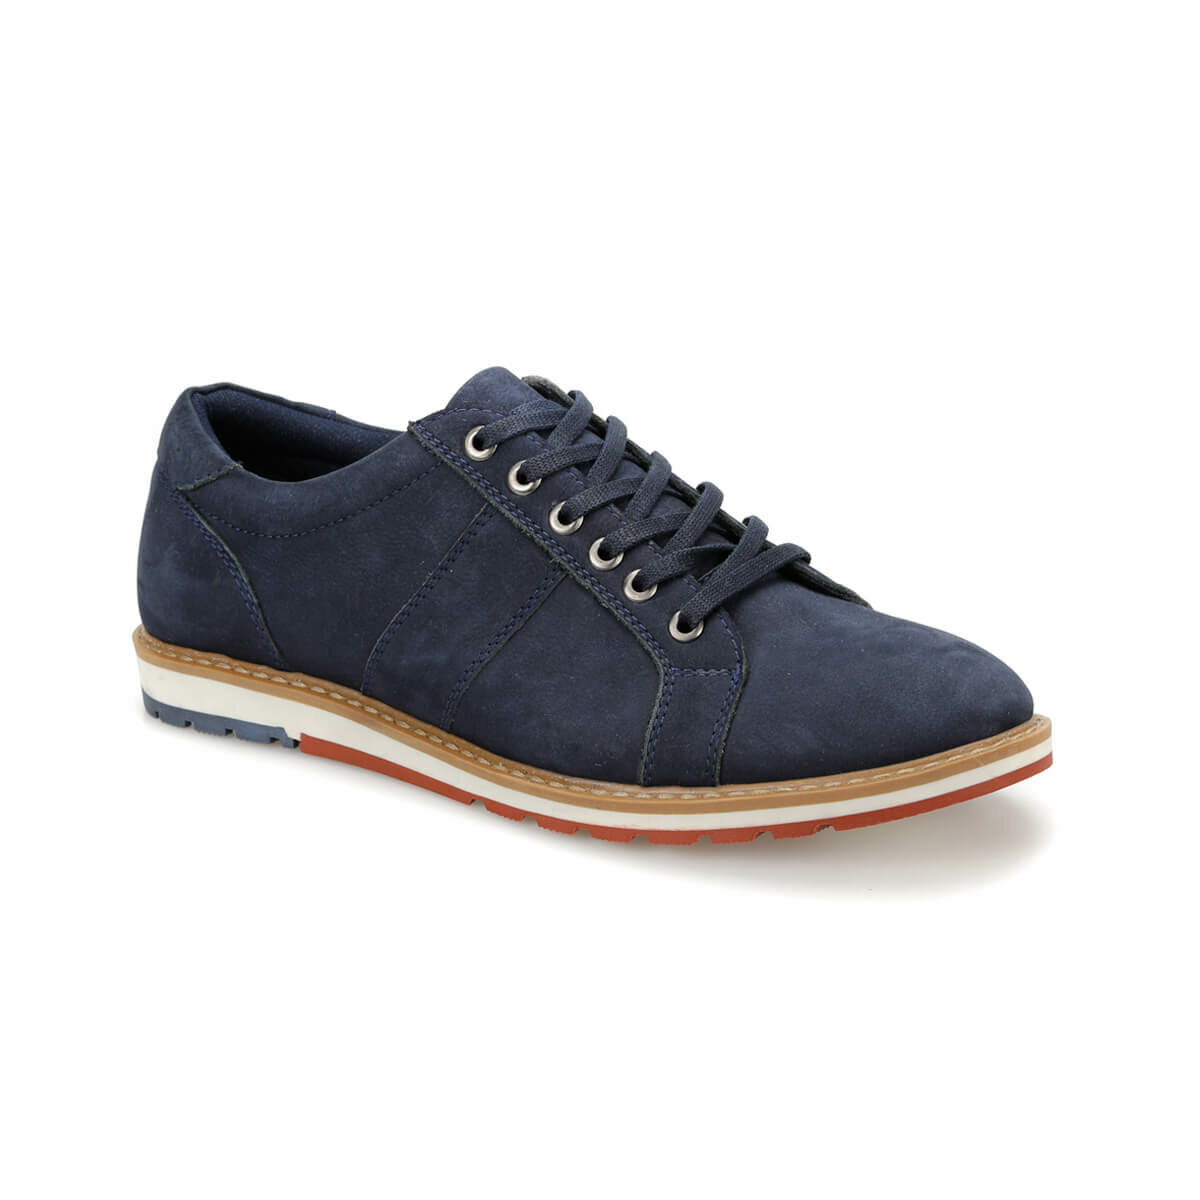 FLO MKM-91115 Navy Blue Men 'S Shoes Oxide